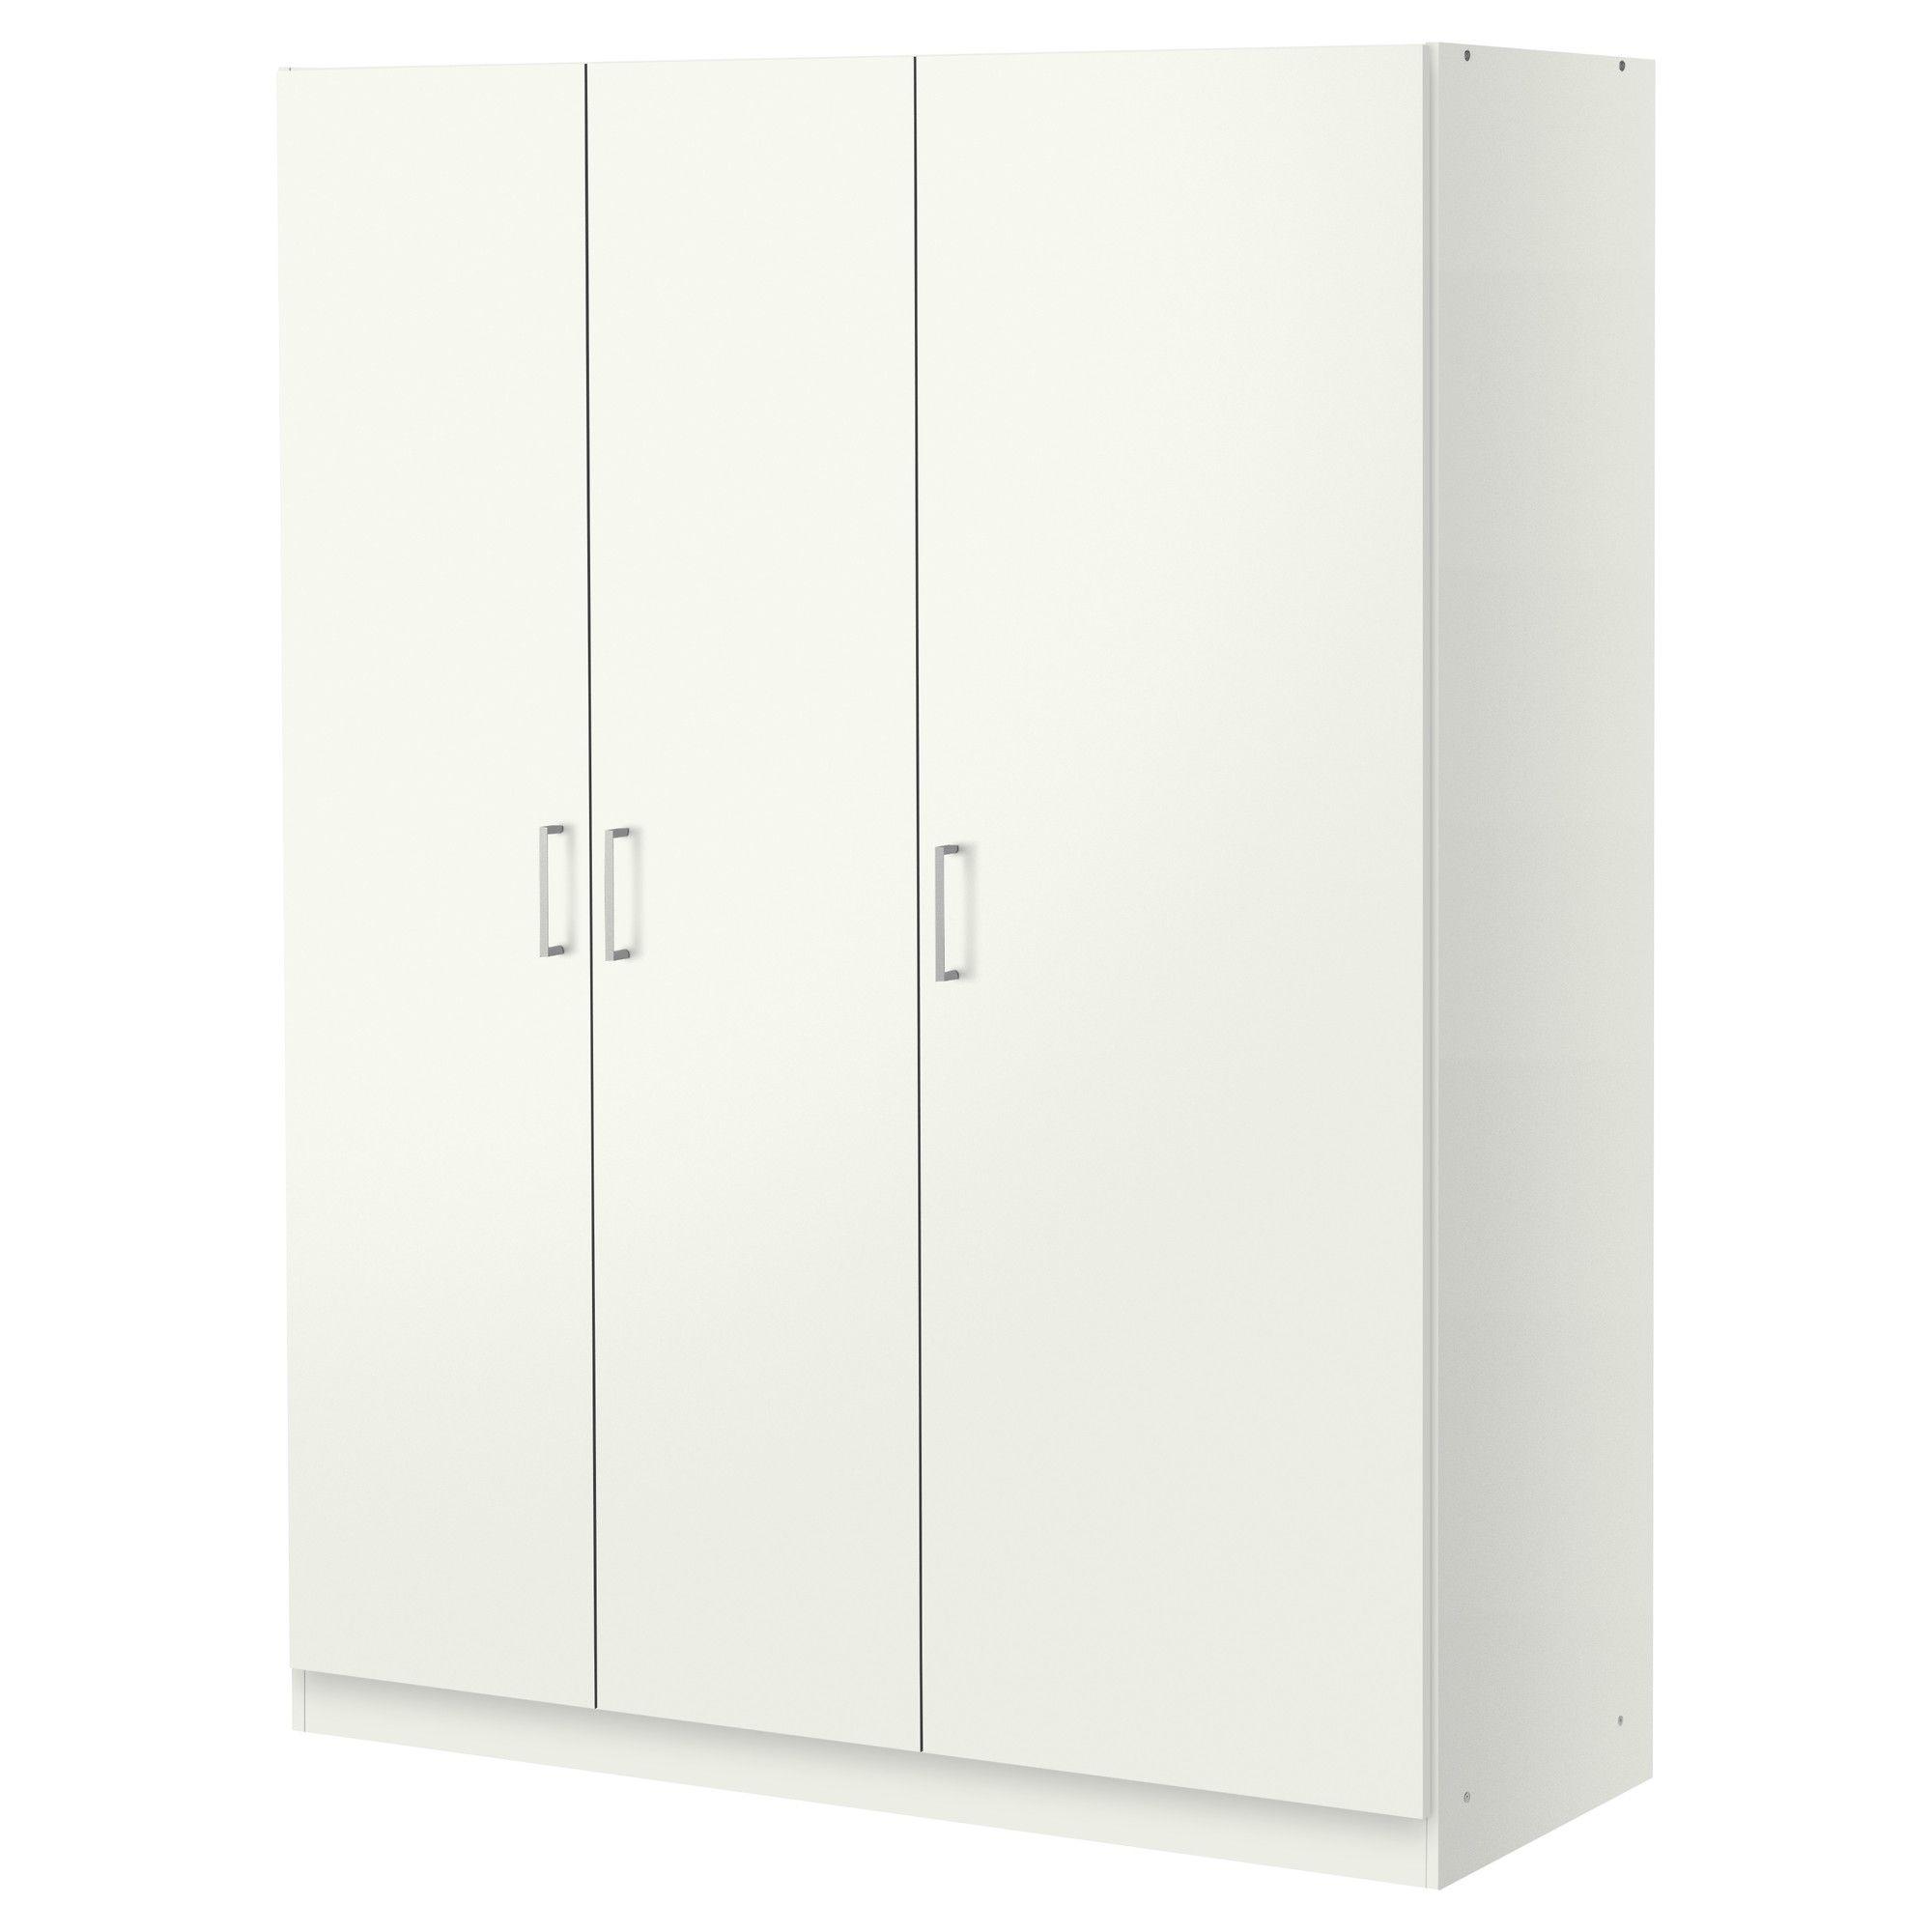 Dombås Garderob Vit Offices Ikea Wardrobe Dombas Wardrobe